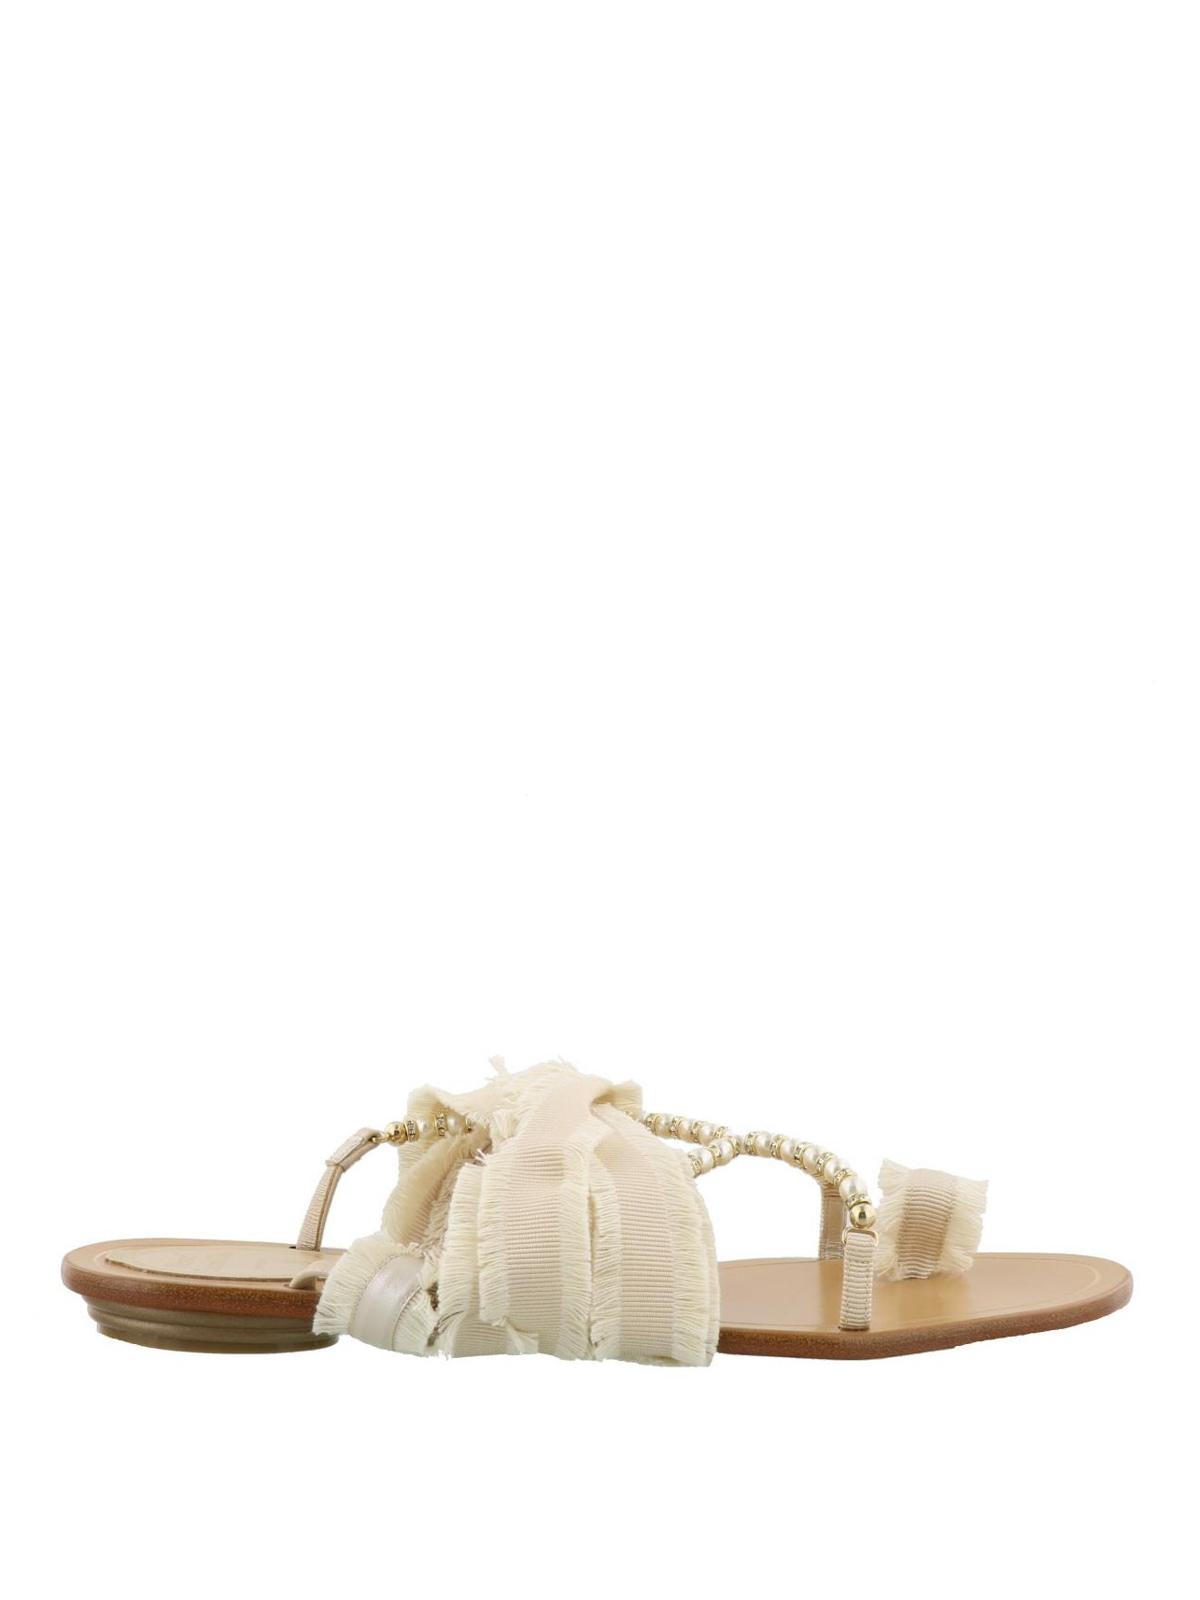 e3899f7dbd437 Rene Caovilla - Ribbon and pearl flat thong sandals - flip flops ...